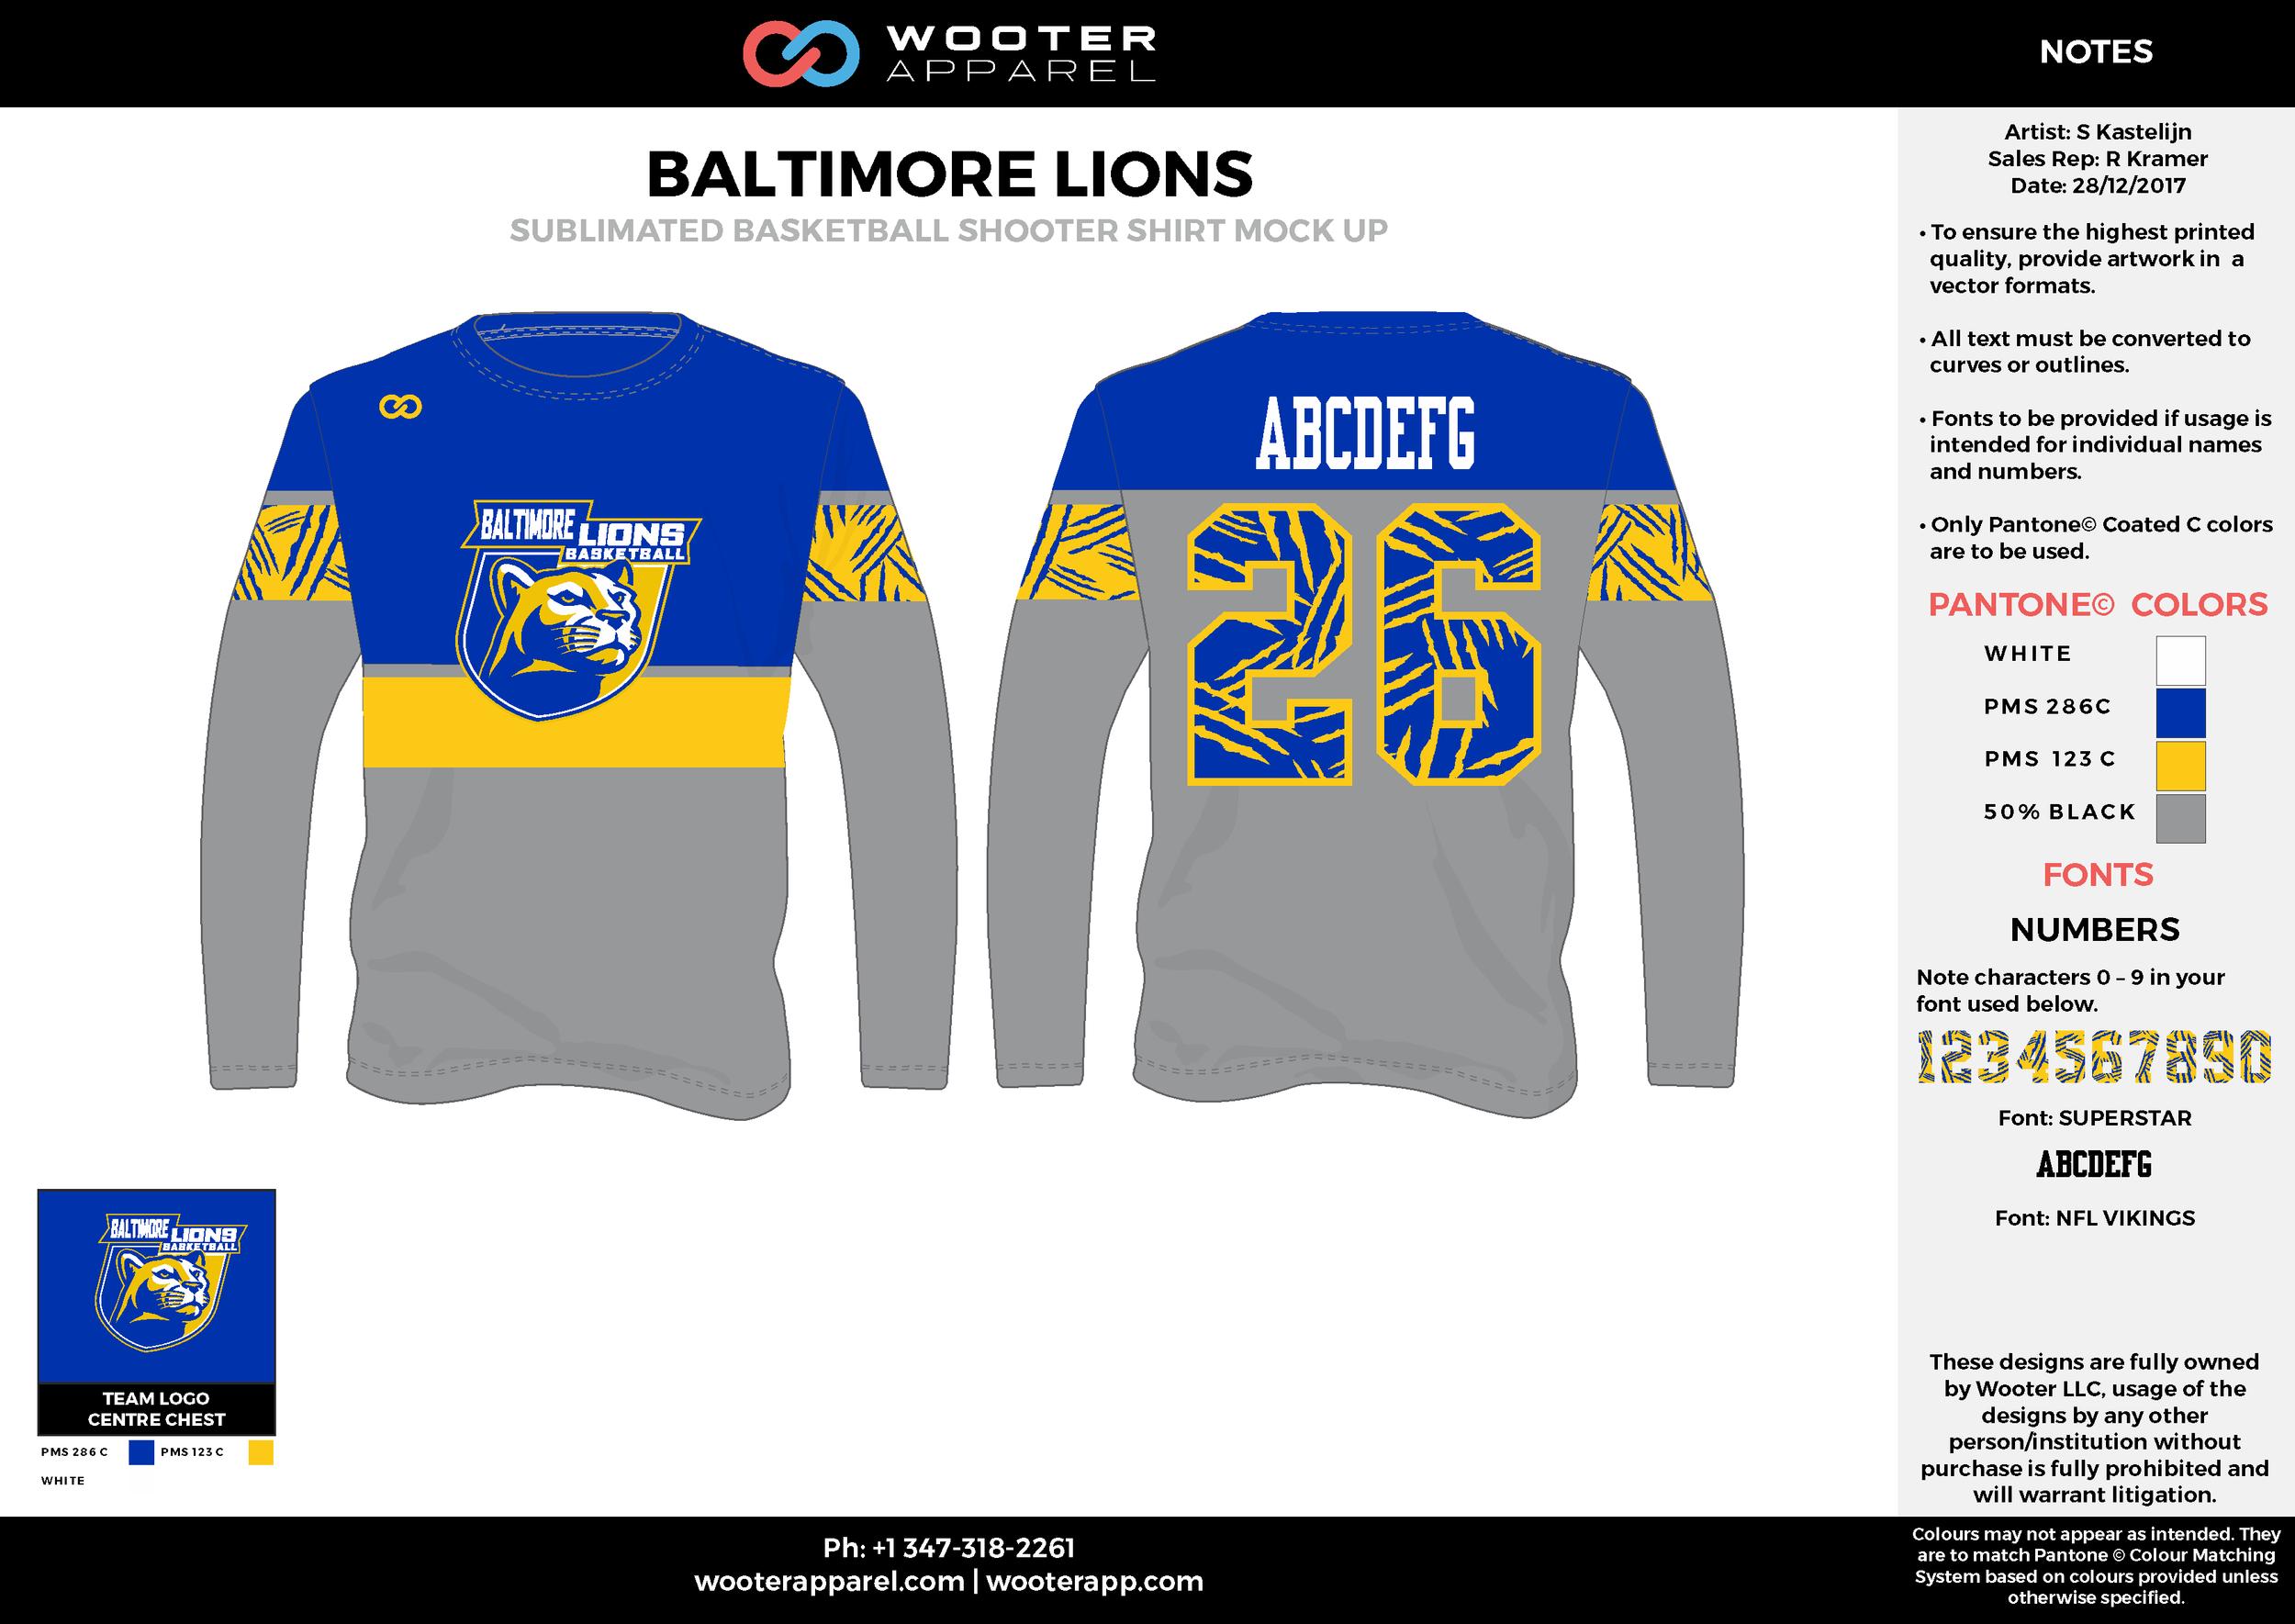 BALTIMORE LIONS blue gray yellow white Basketball Long Sleeve Shooting Shirt